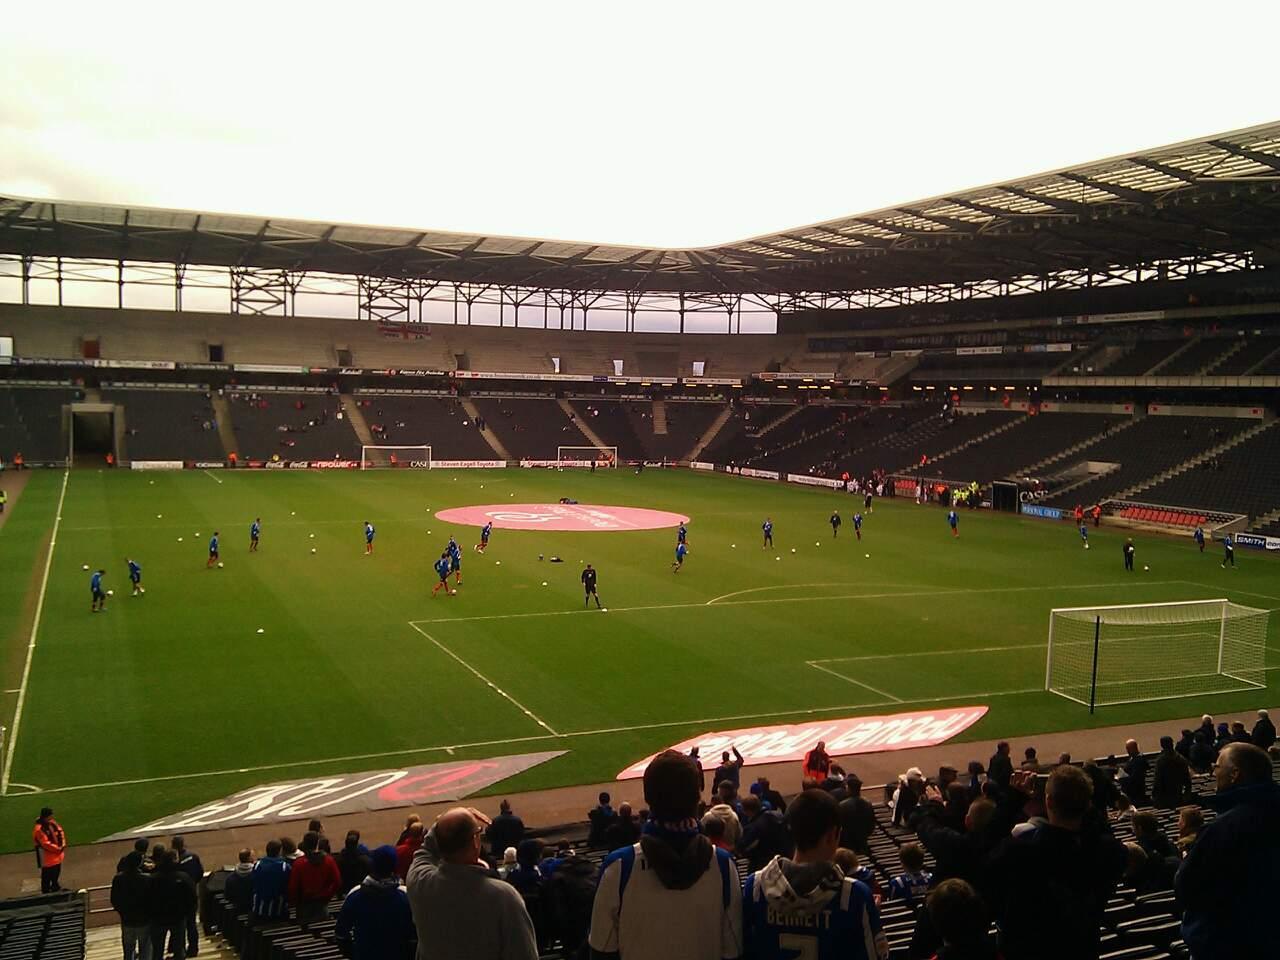 Stadium:MK Section 34 Row DD Seat 972